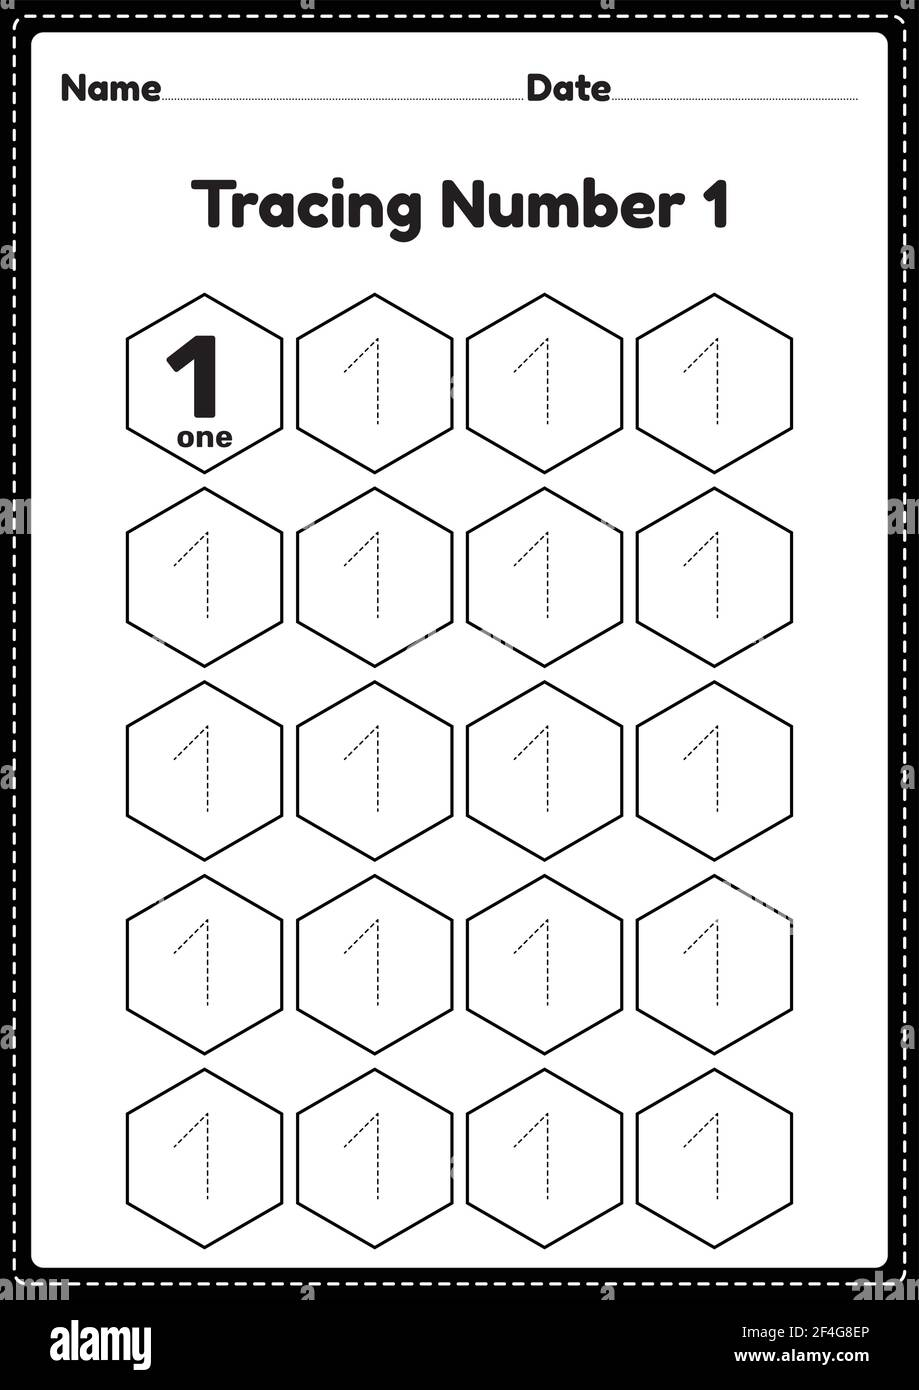 Tracing number 20 worksheet for kindergarten and preschool kids for ...